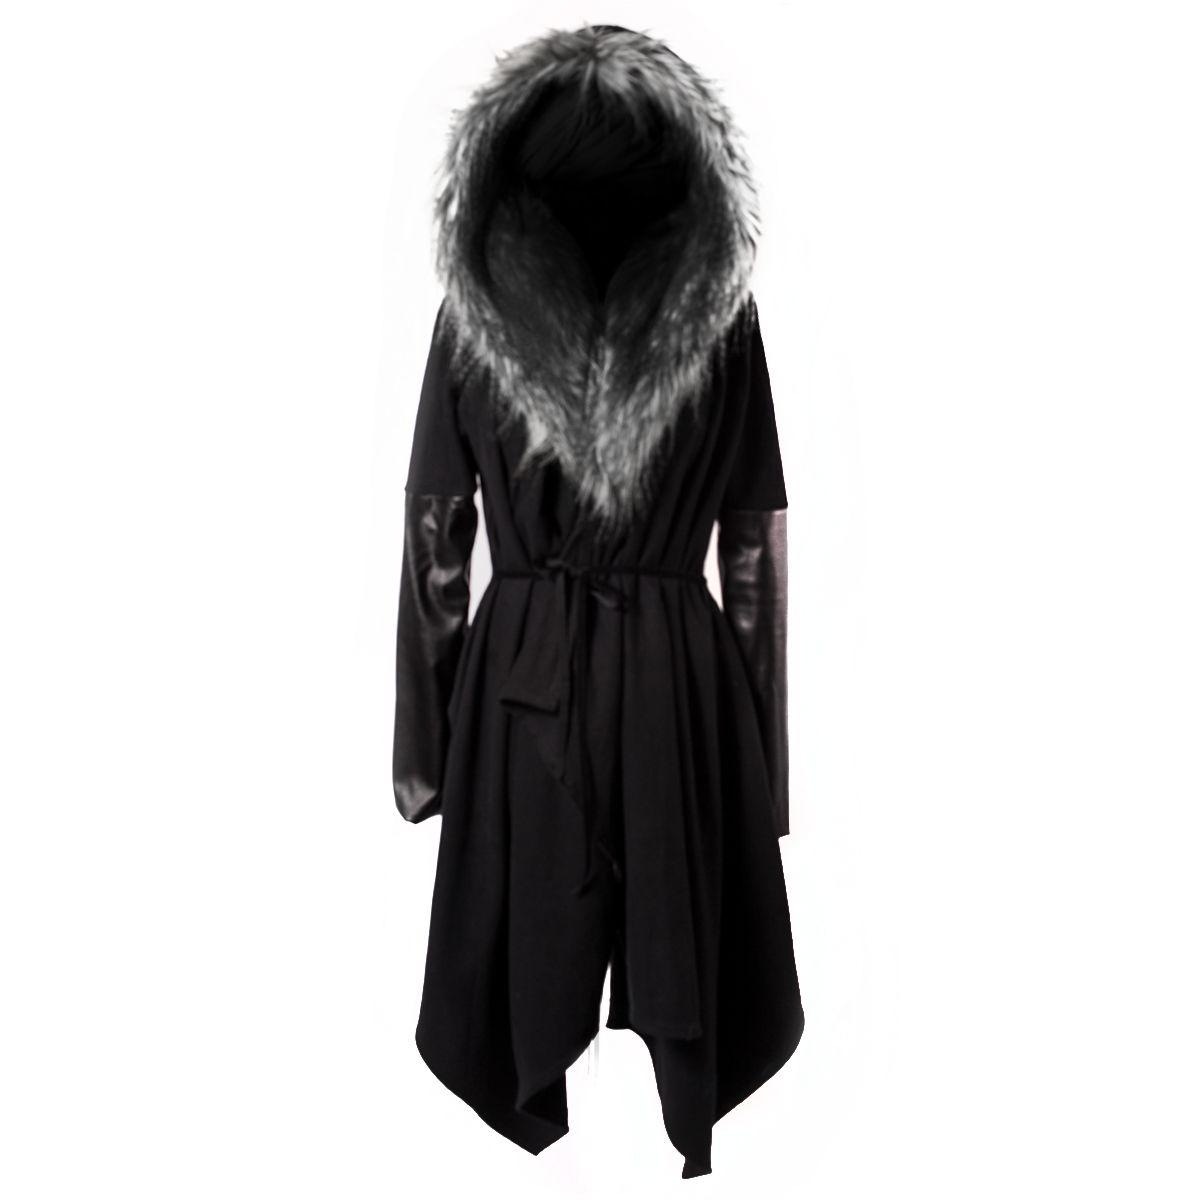 Asylum Coat v.2 Wolfskin | Sanctus